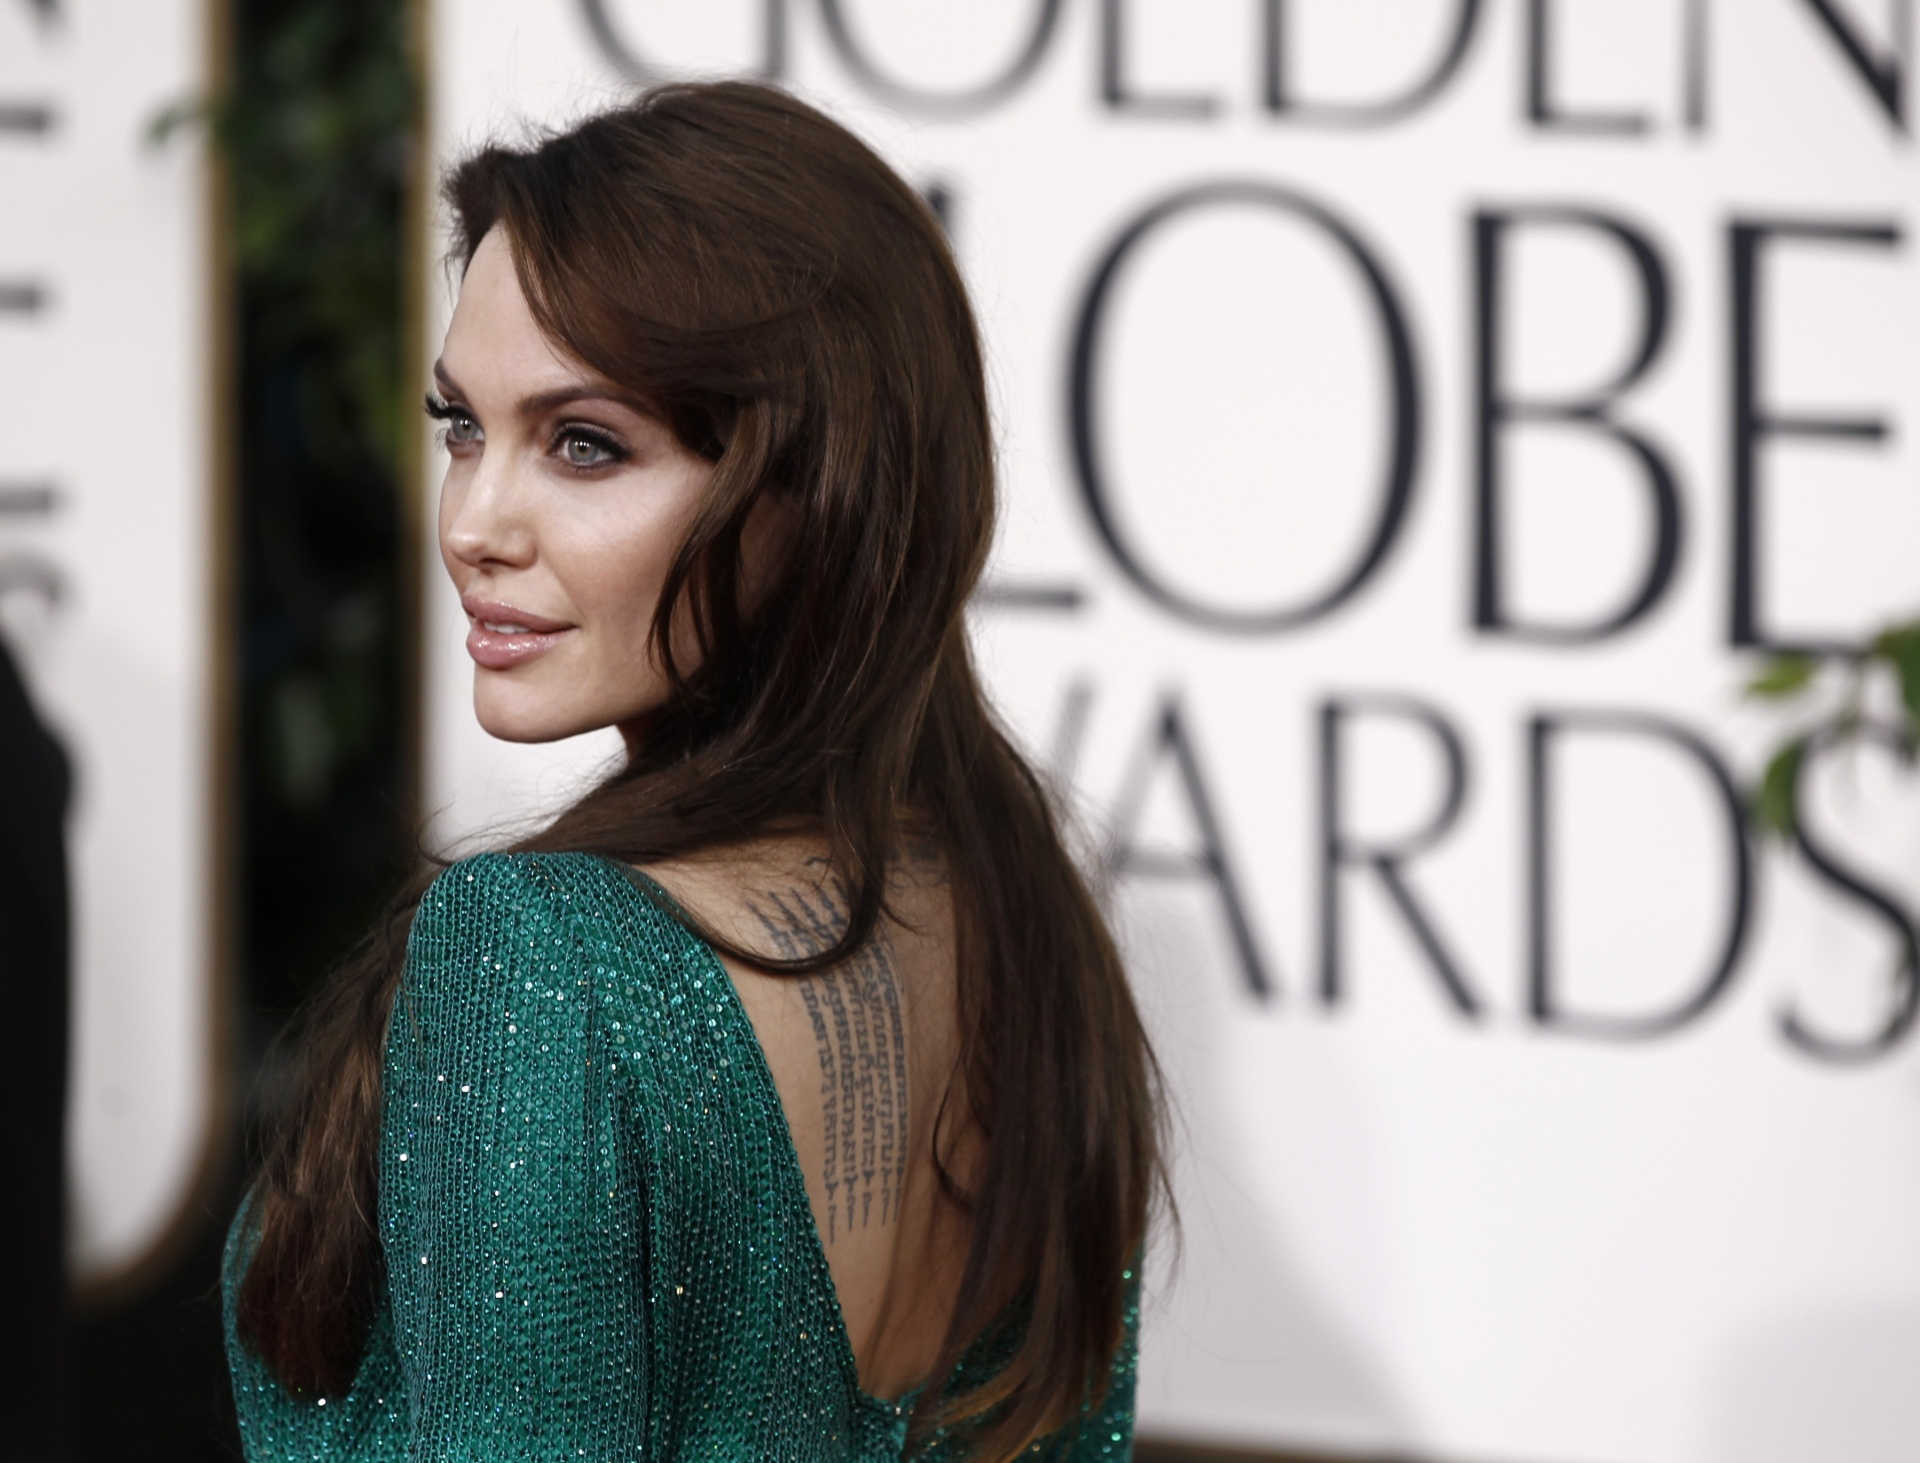 Angelina jolie ver foto chica desnuda gratis 30